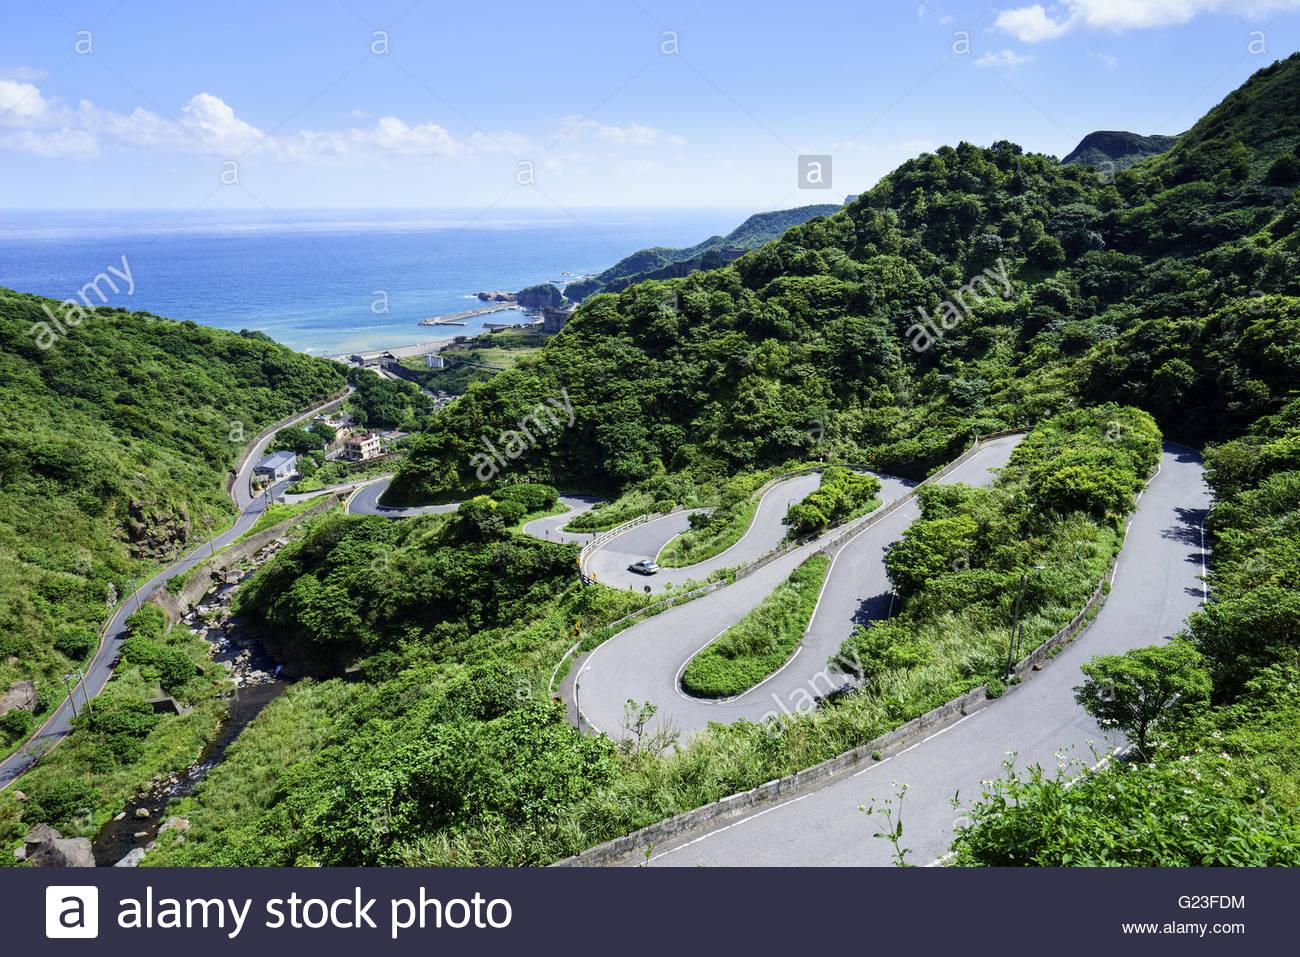 jinshui road in taiwan